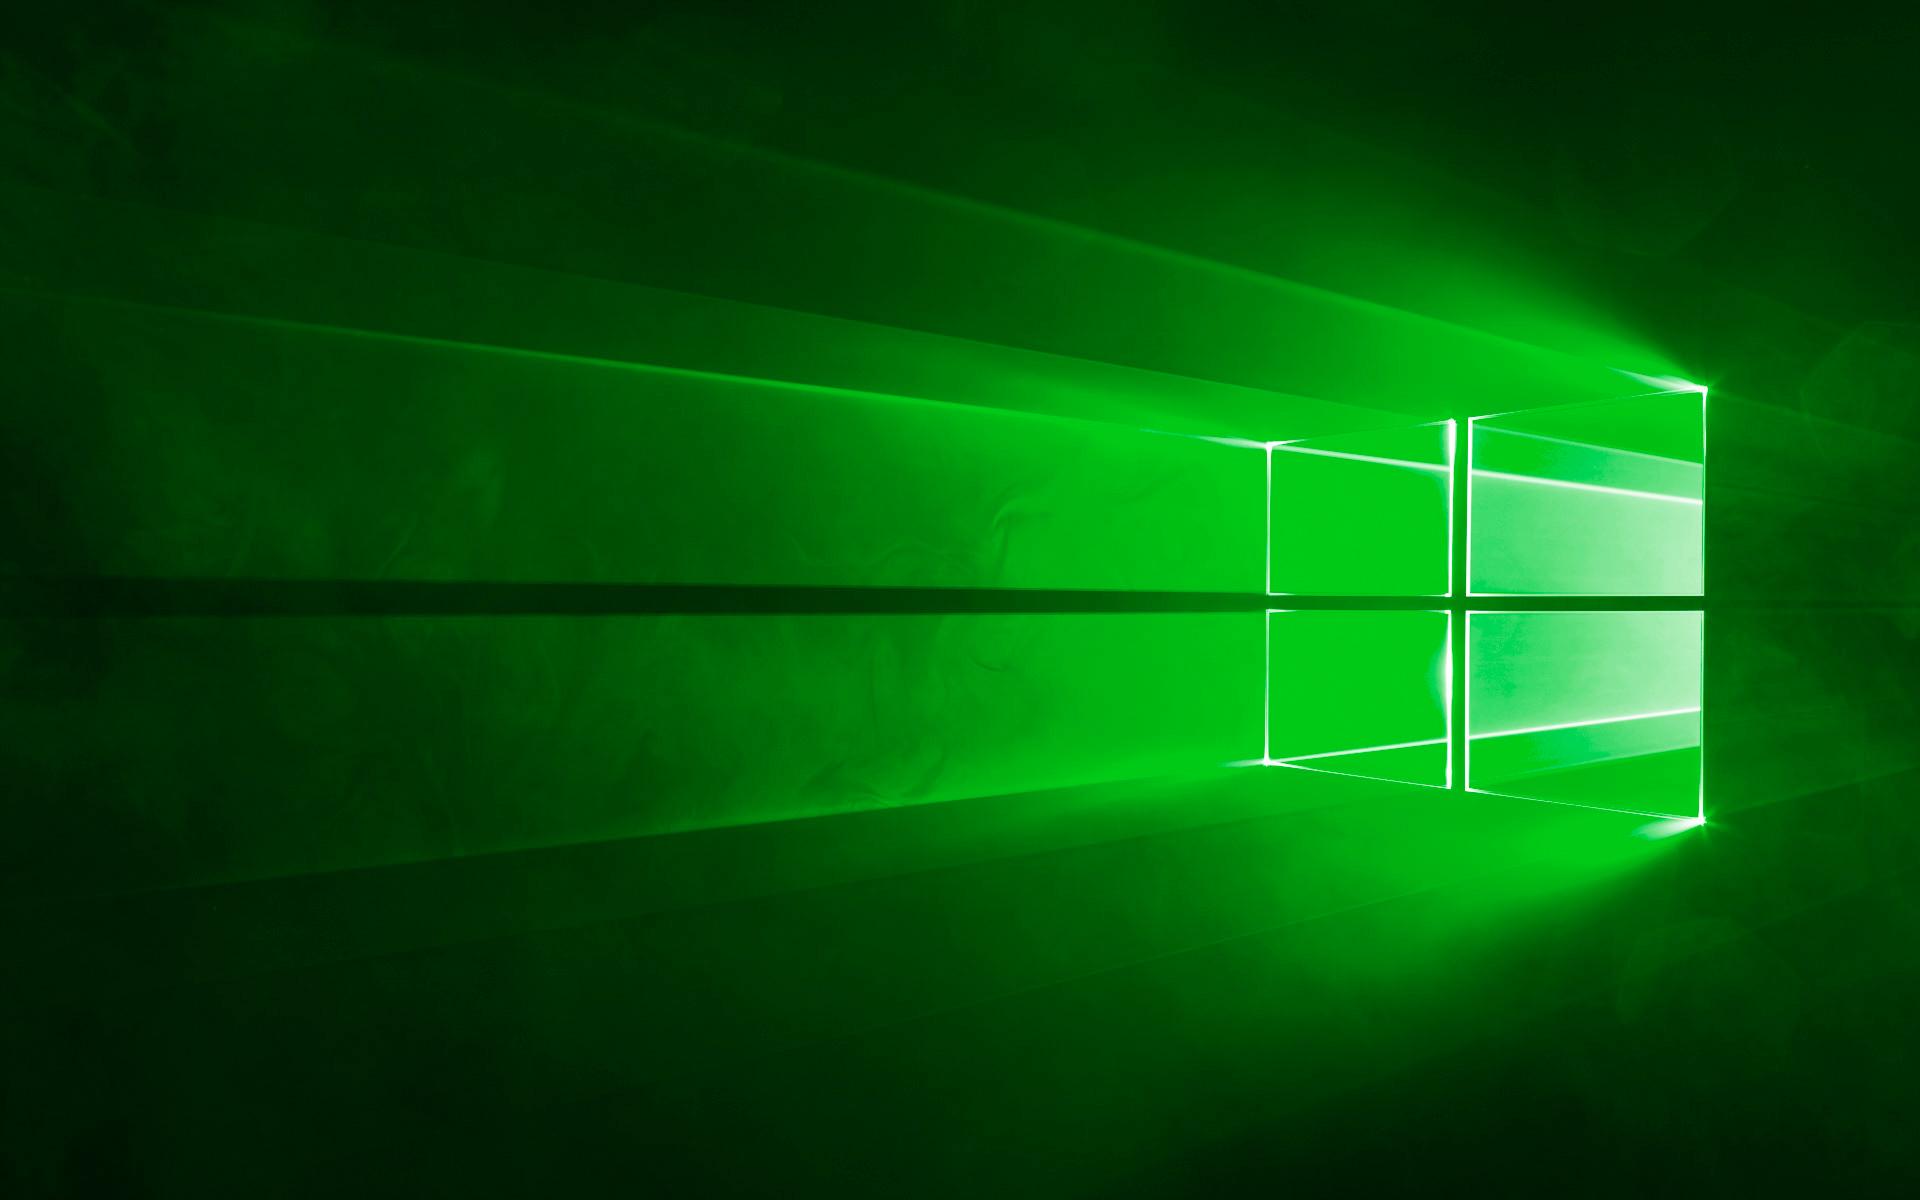 1280x800 logo windows - photo #28